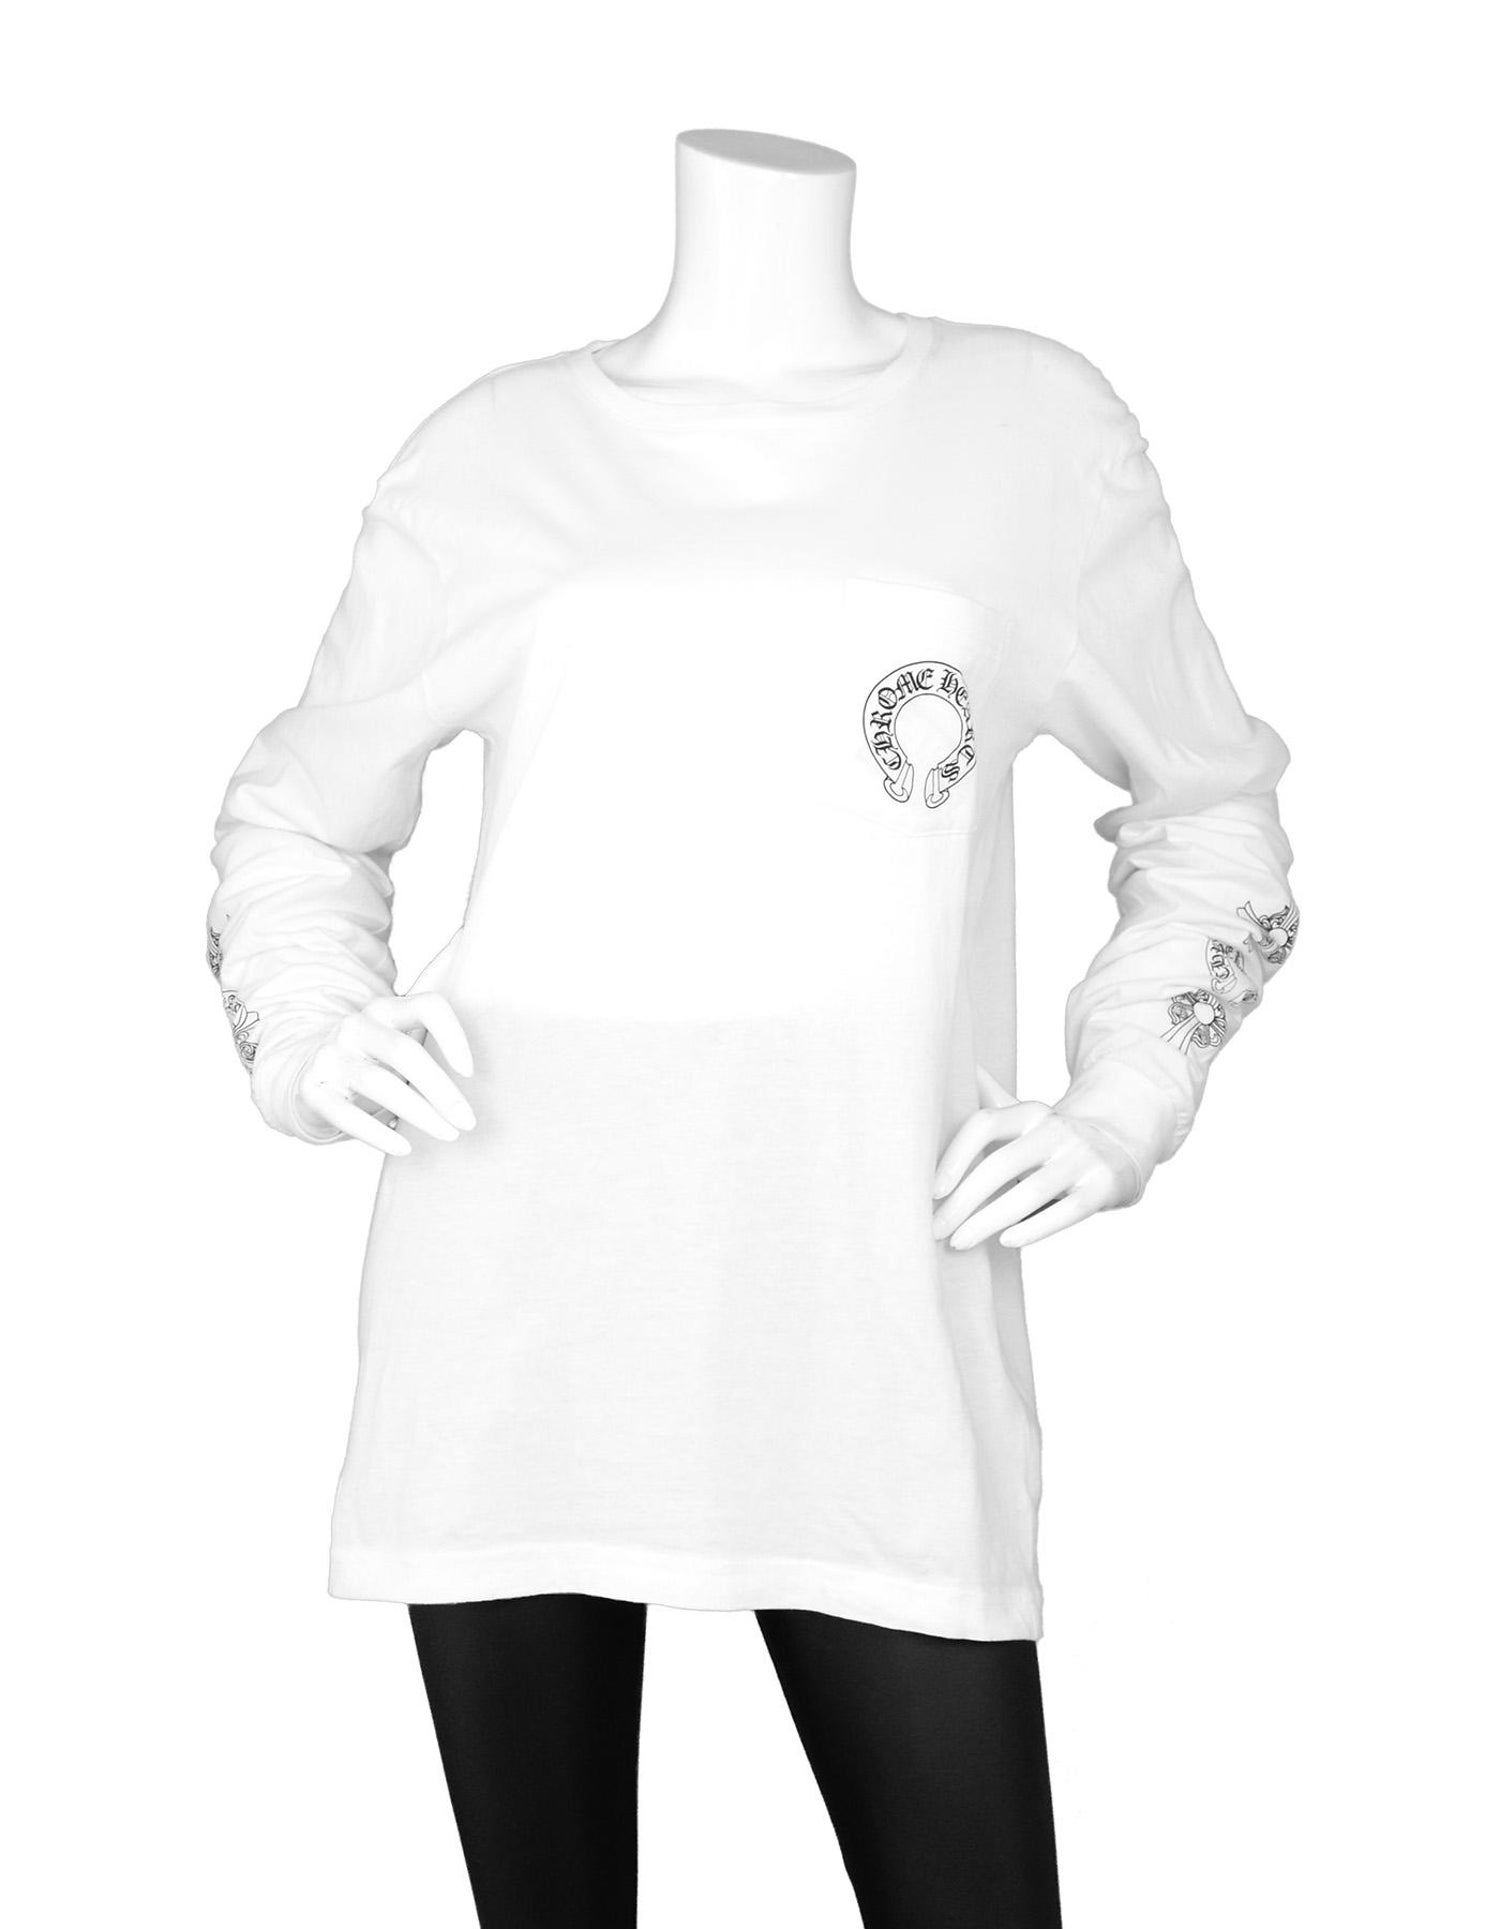 0c6f6112069b Chrome Hearts Men s Unisex White Longsleeve Logo Pocket T-Shirt Sz L For  Sale at 1stdibs